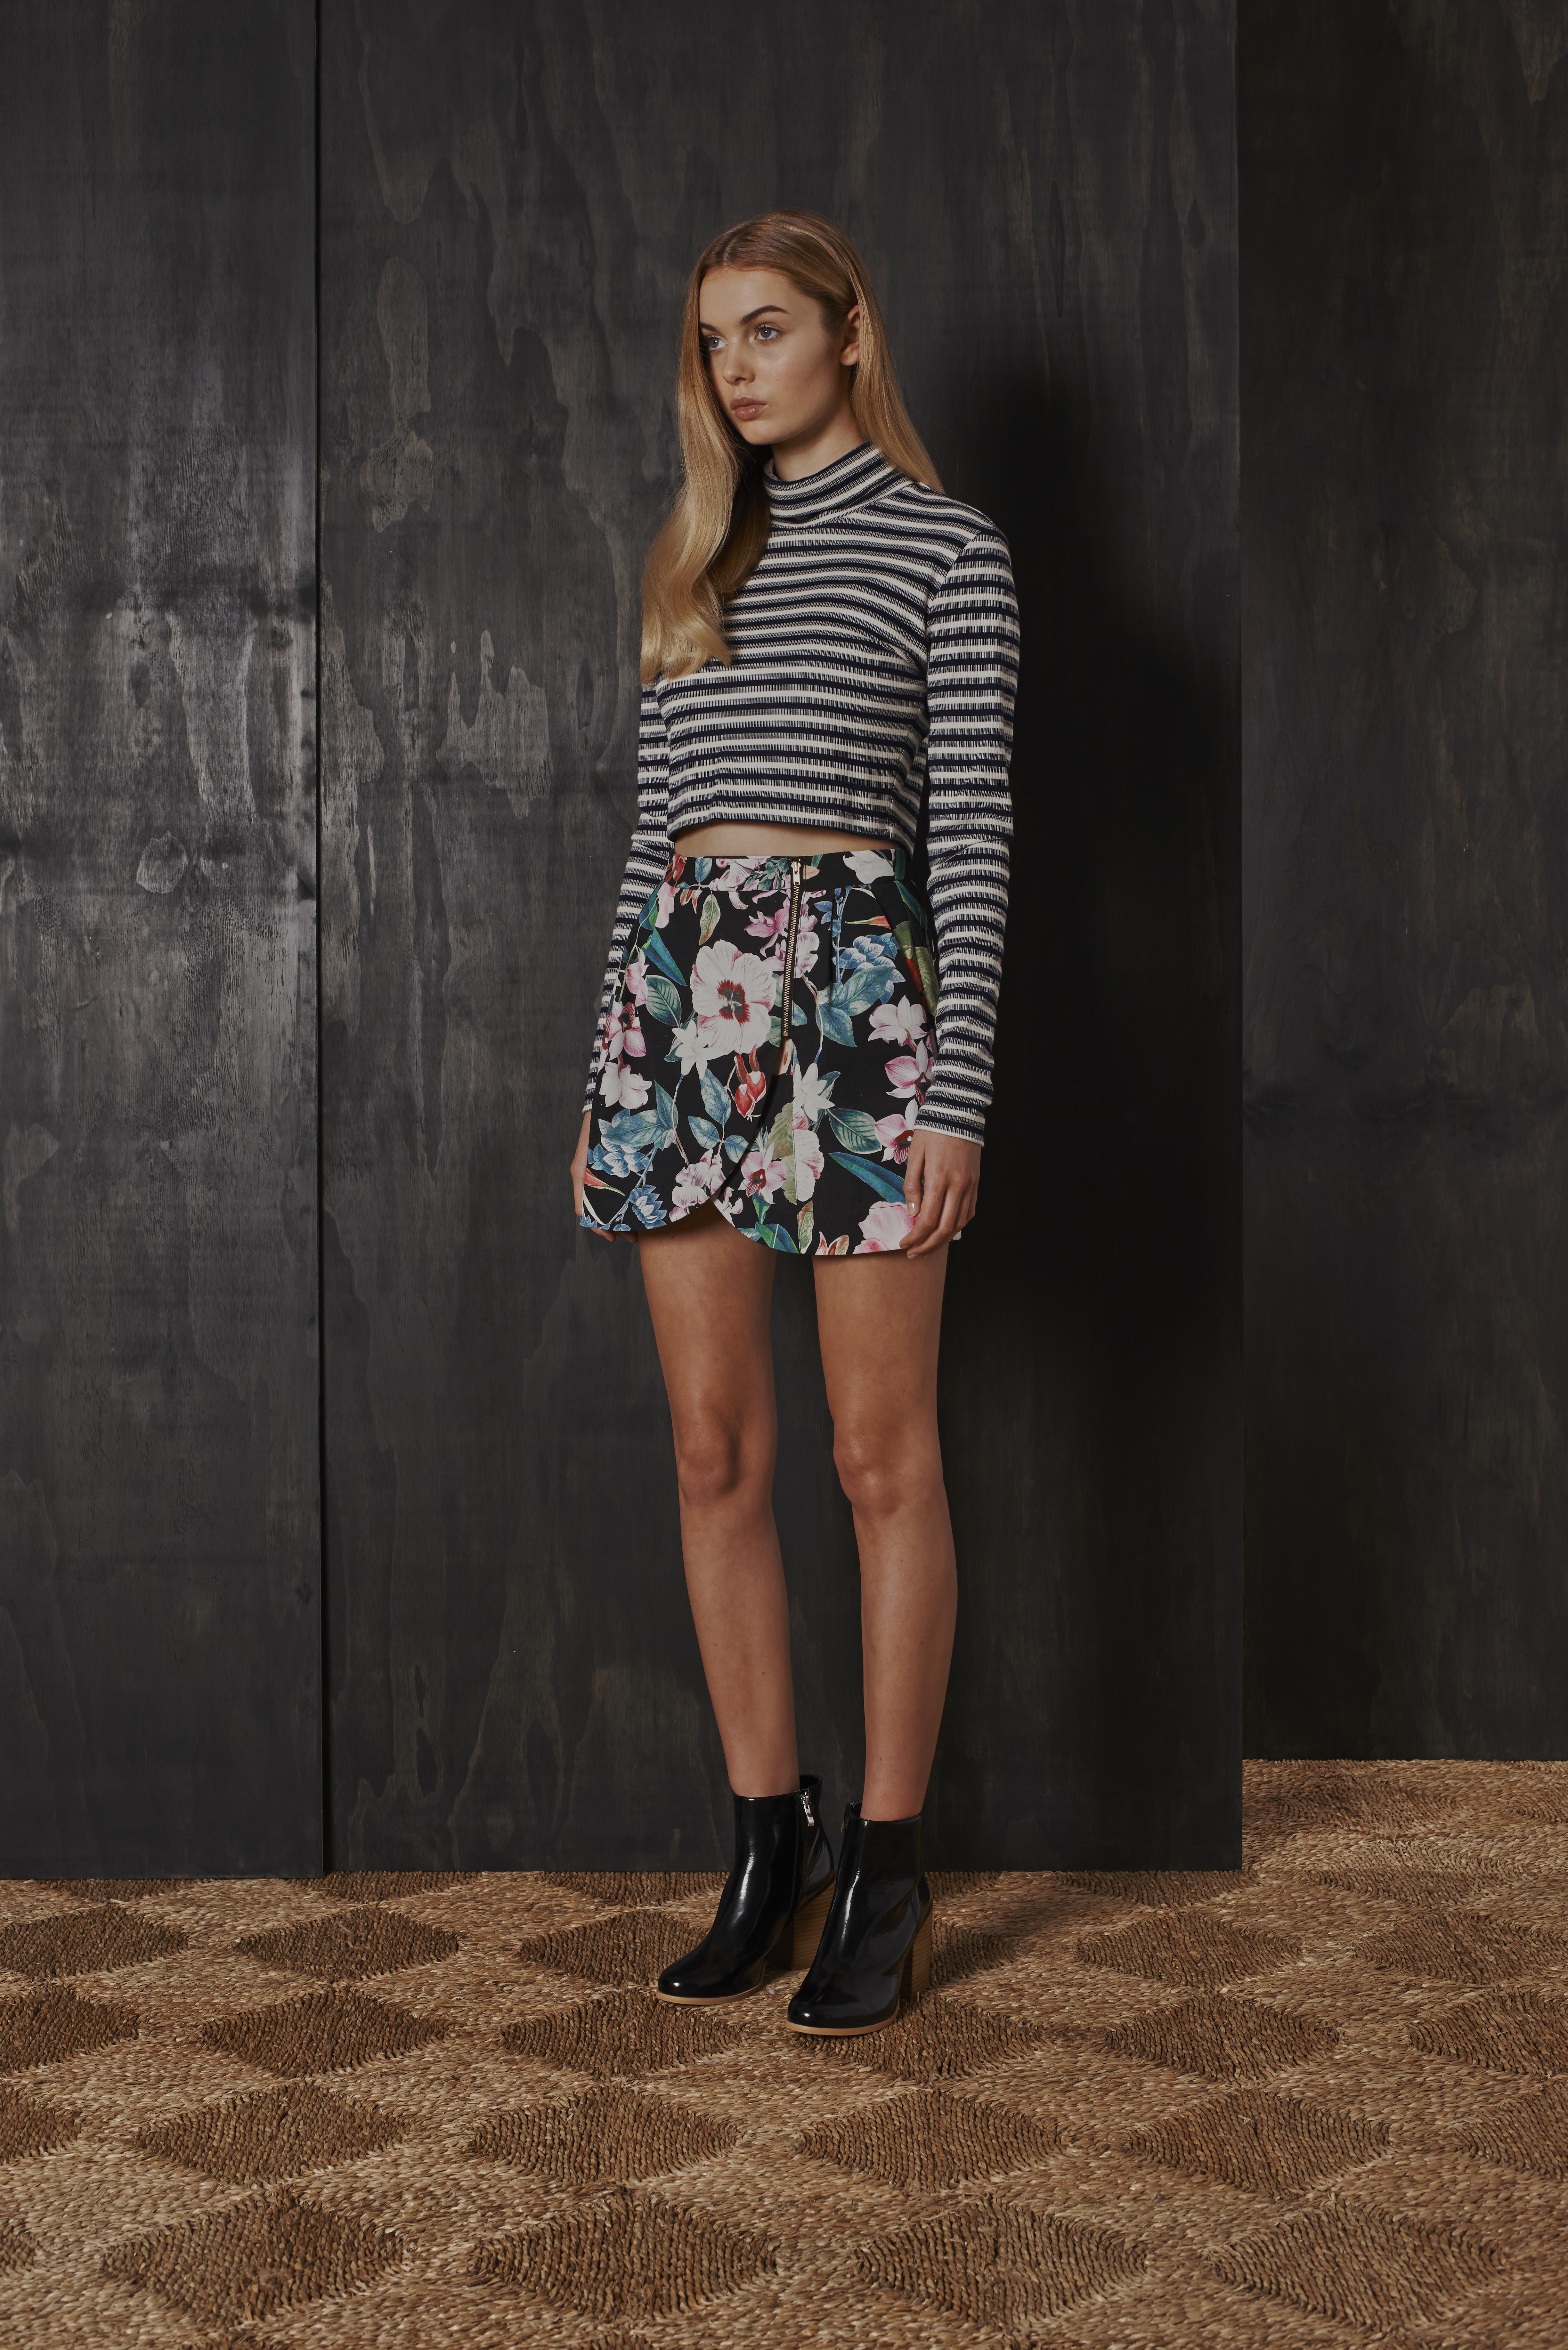 RUBY Storm Turtleneck, Nectarine Petal Skirt & Willow Boot